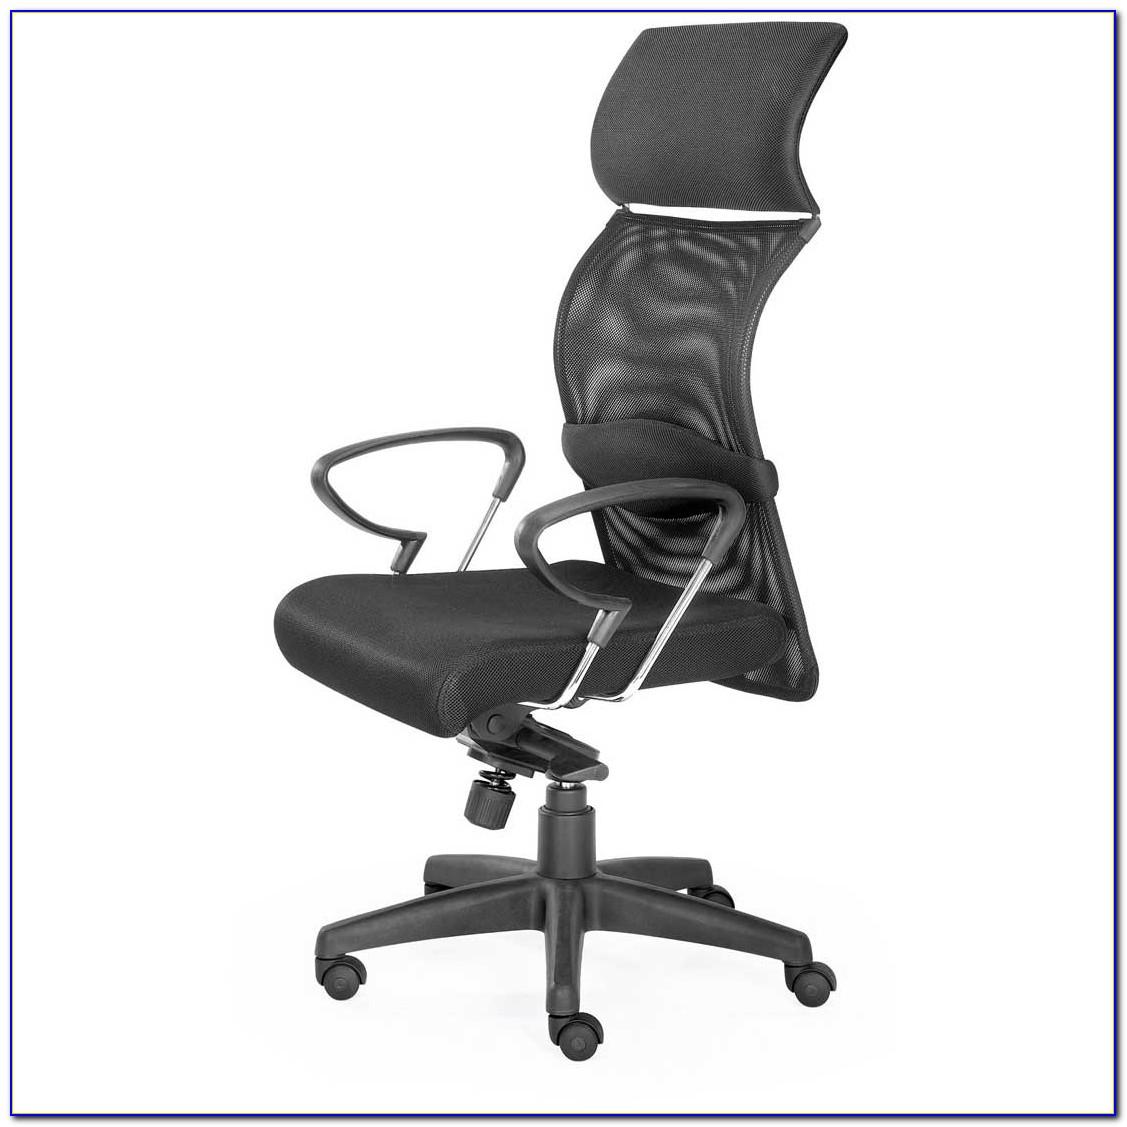 Ergonomic Desk Chairs Melbourne